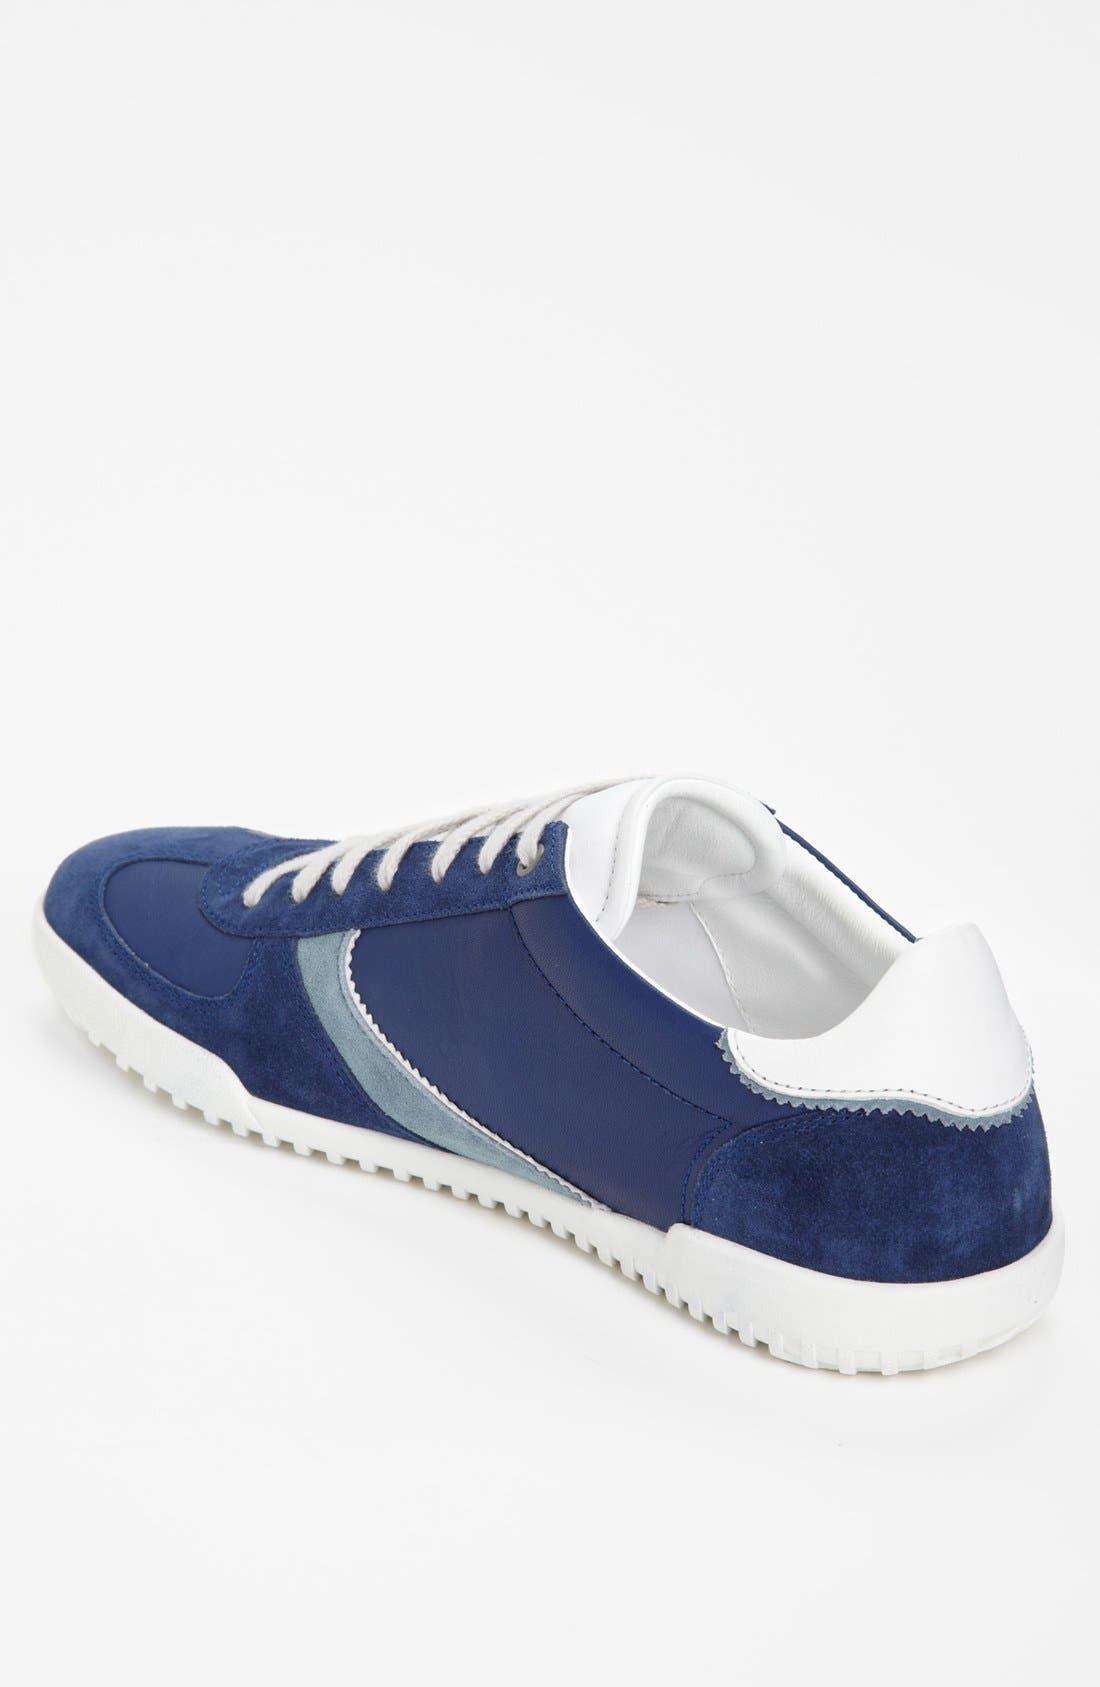 Alternate Image 2  - Dolce&Gabbana 'Parcours' Sneaker